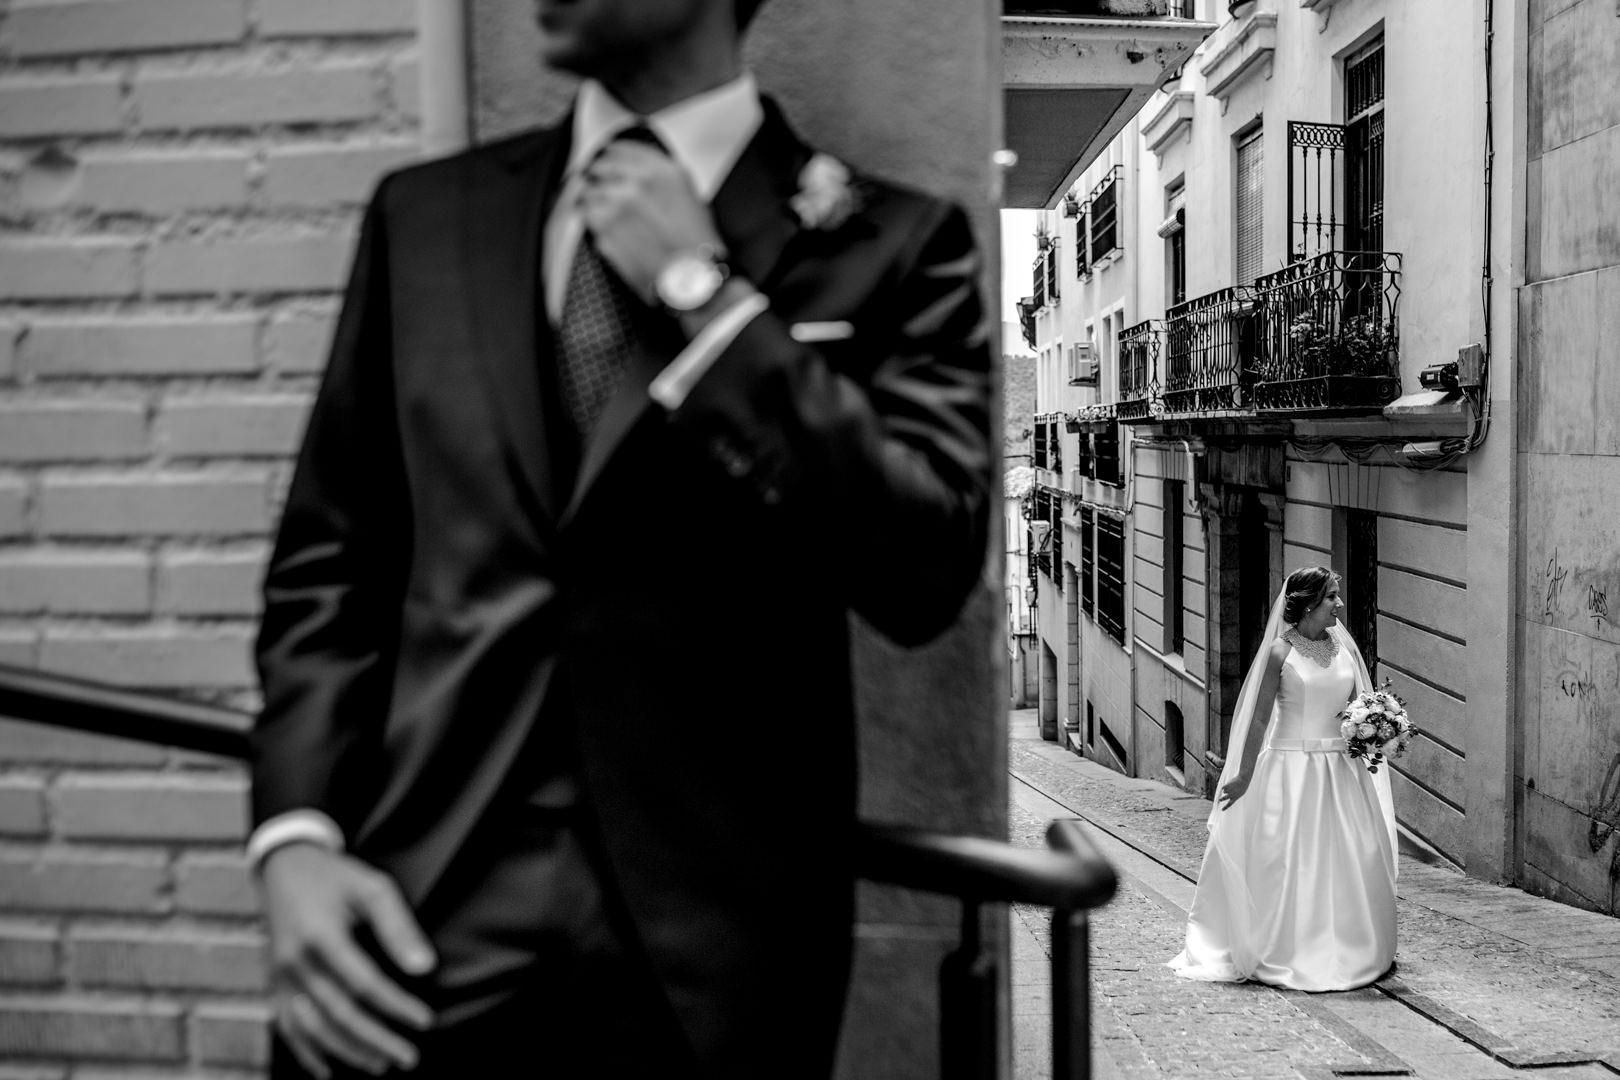 Boda-Catedral-Jaen-Hamburgo-Maria-David-engagement-Rafael-Torres-fotografo-bodas-sevilla-madrid-barcelona-wedding-photographer--32.jpg